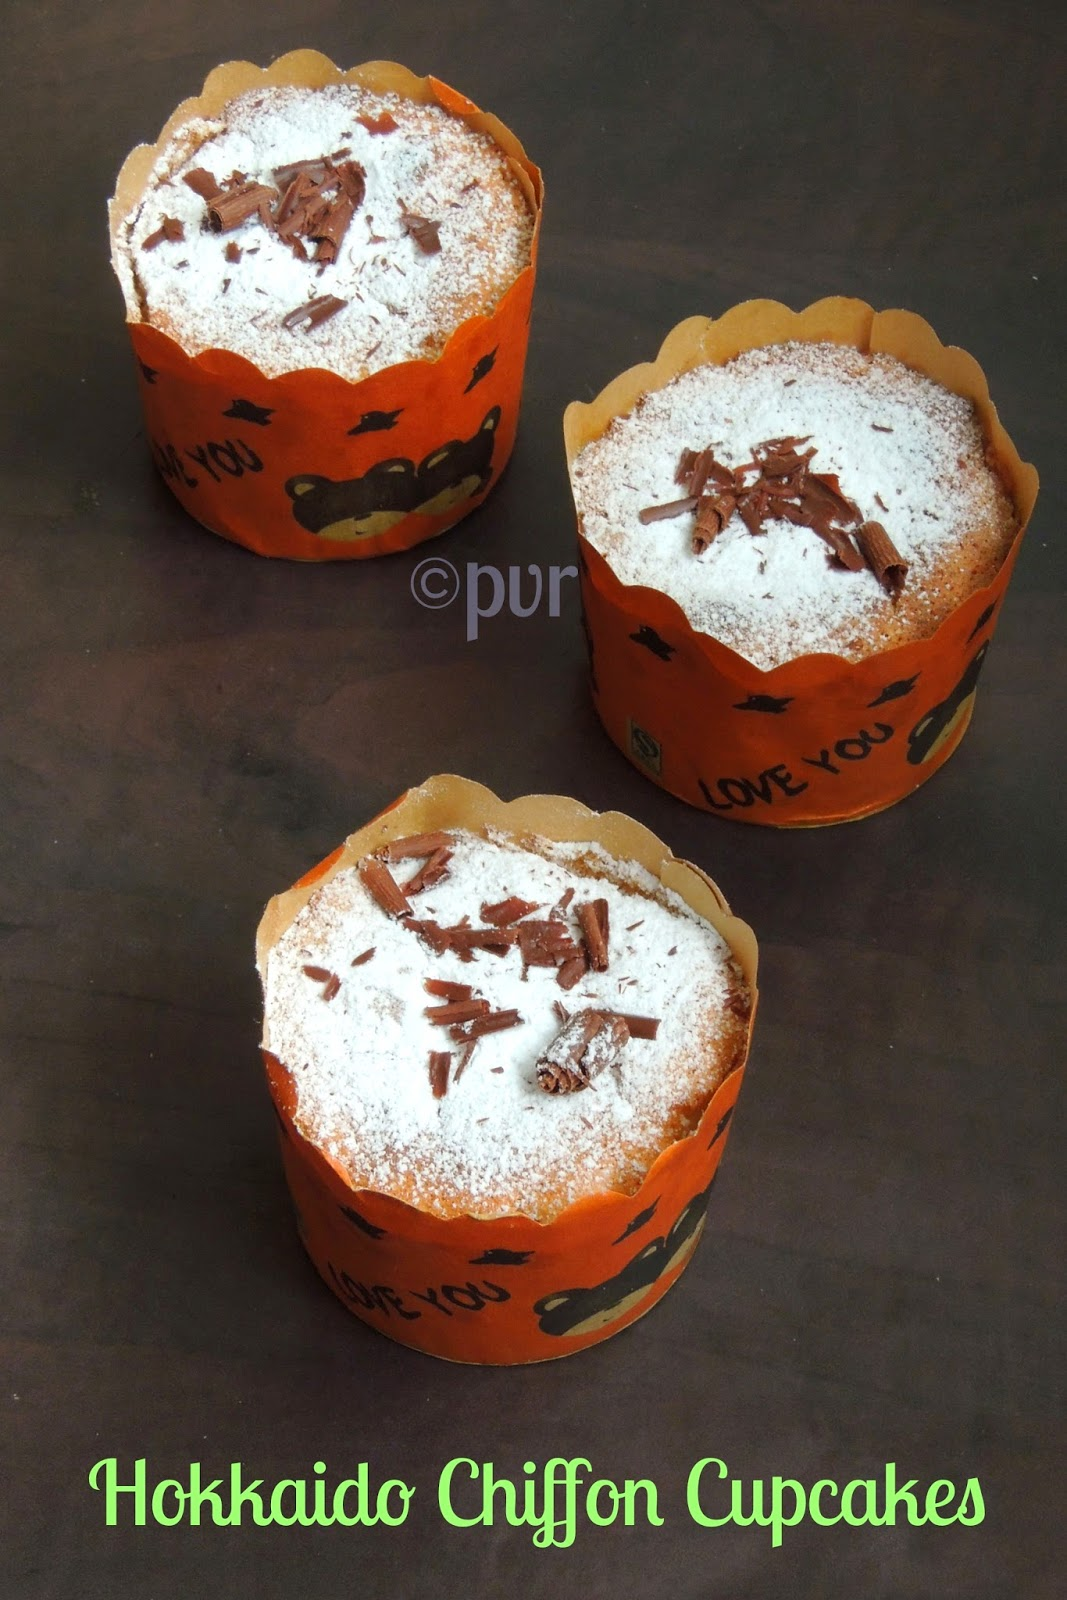 Hokkaida style chiffon cupcakes, Hokkaido chiffon cupcakes